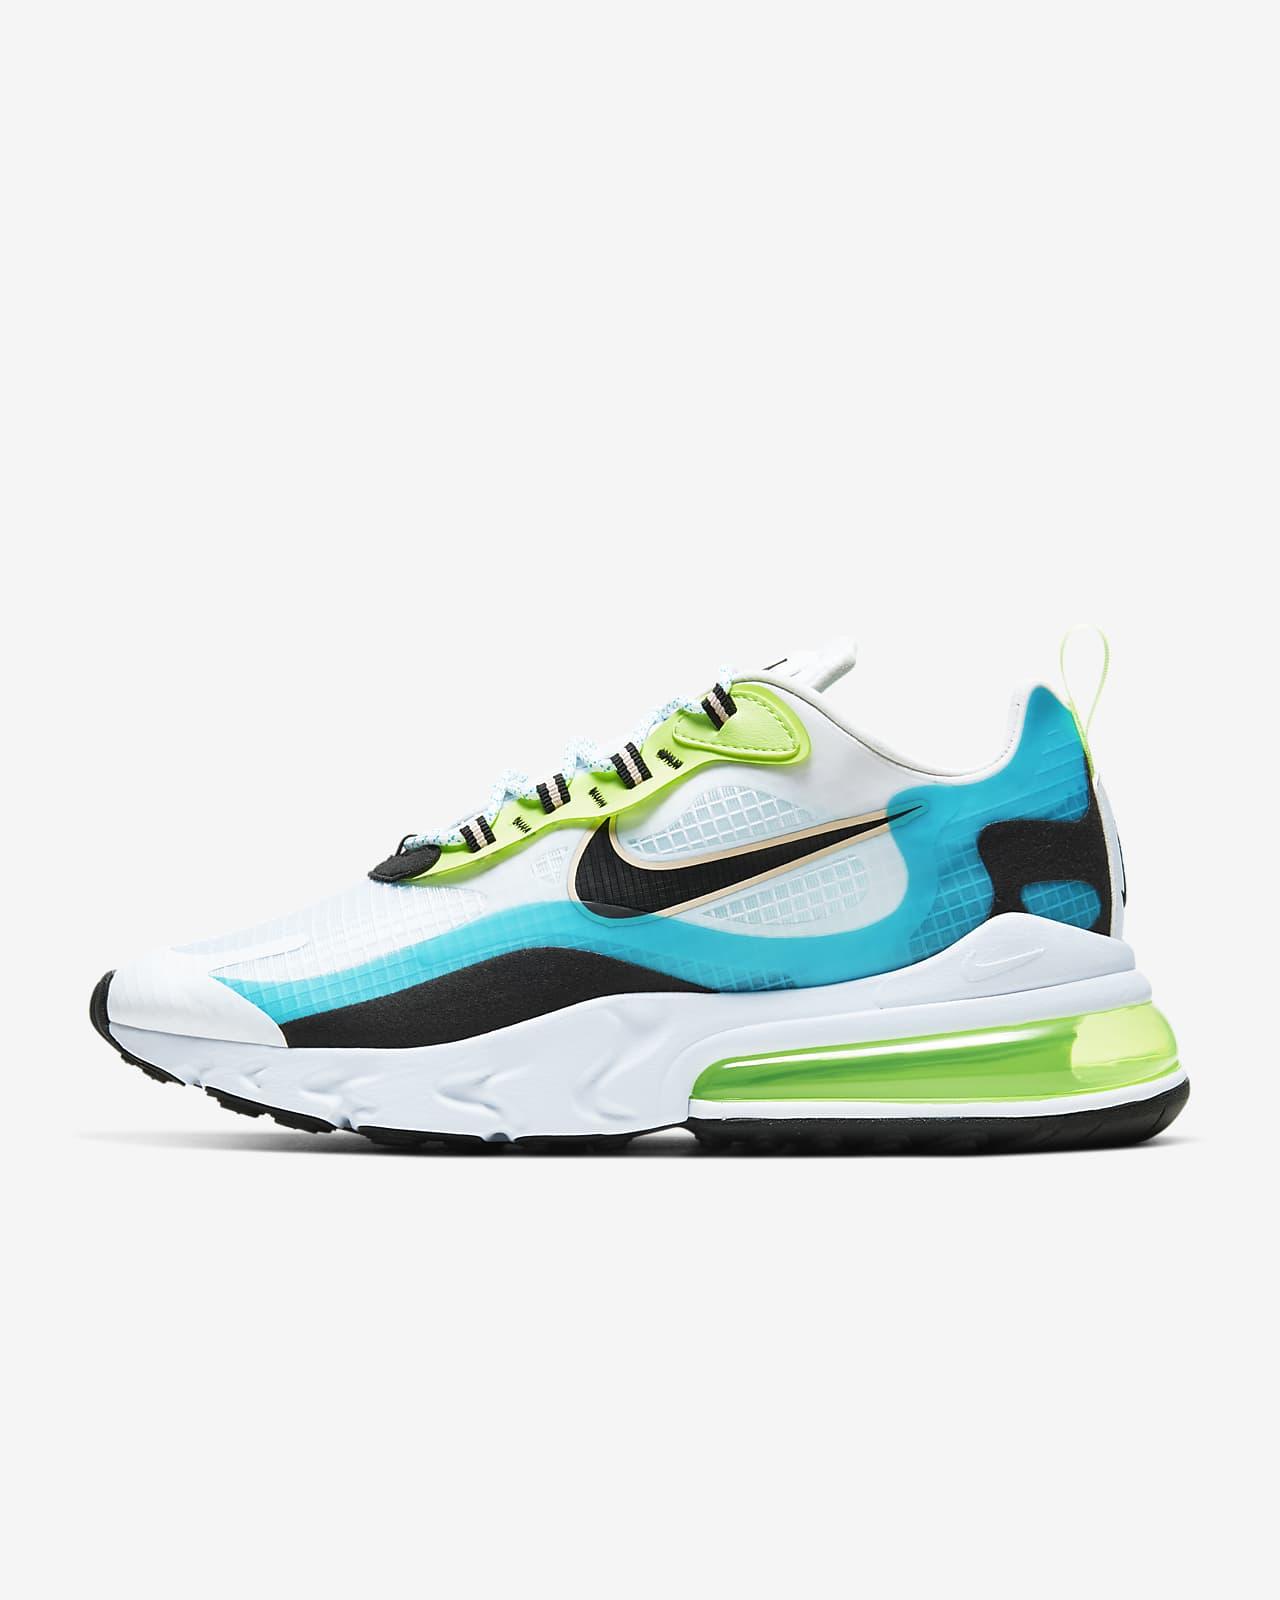 Nike Air Max 270 React SE Herrenschuh